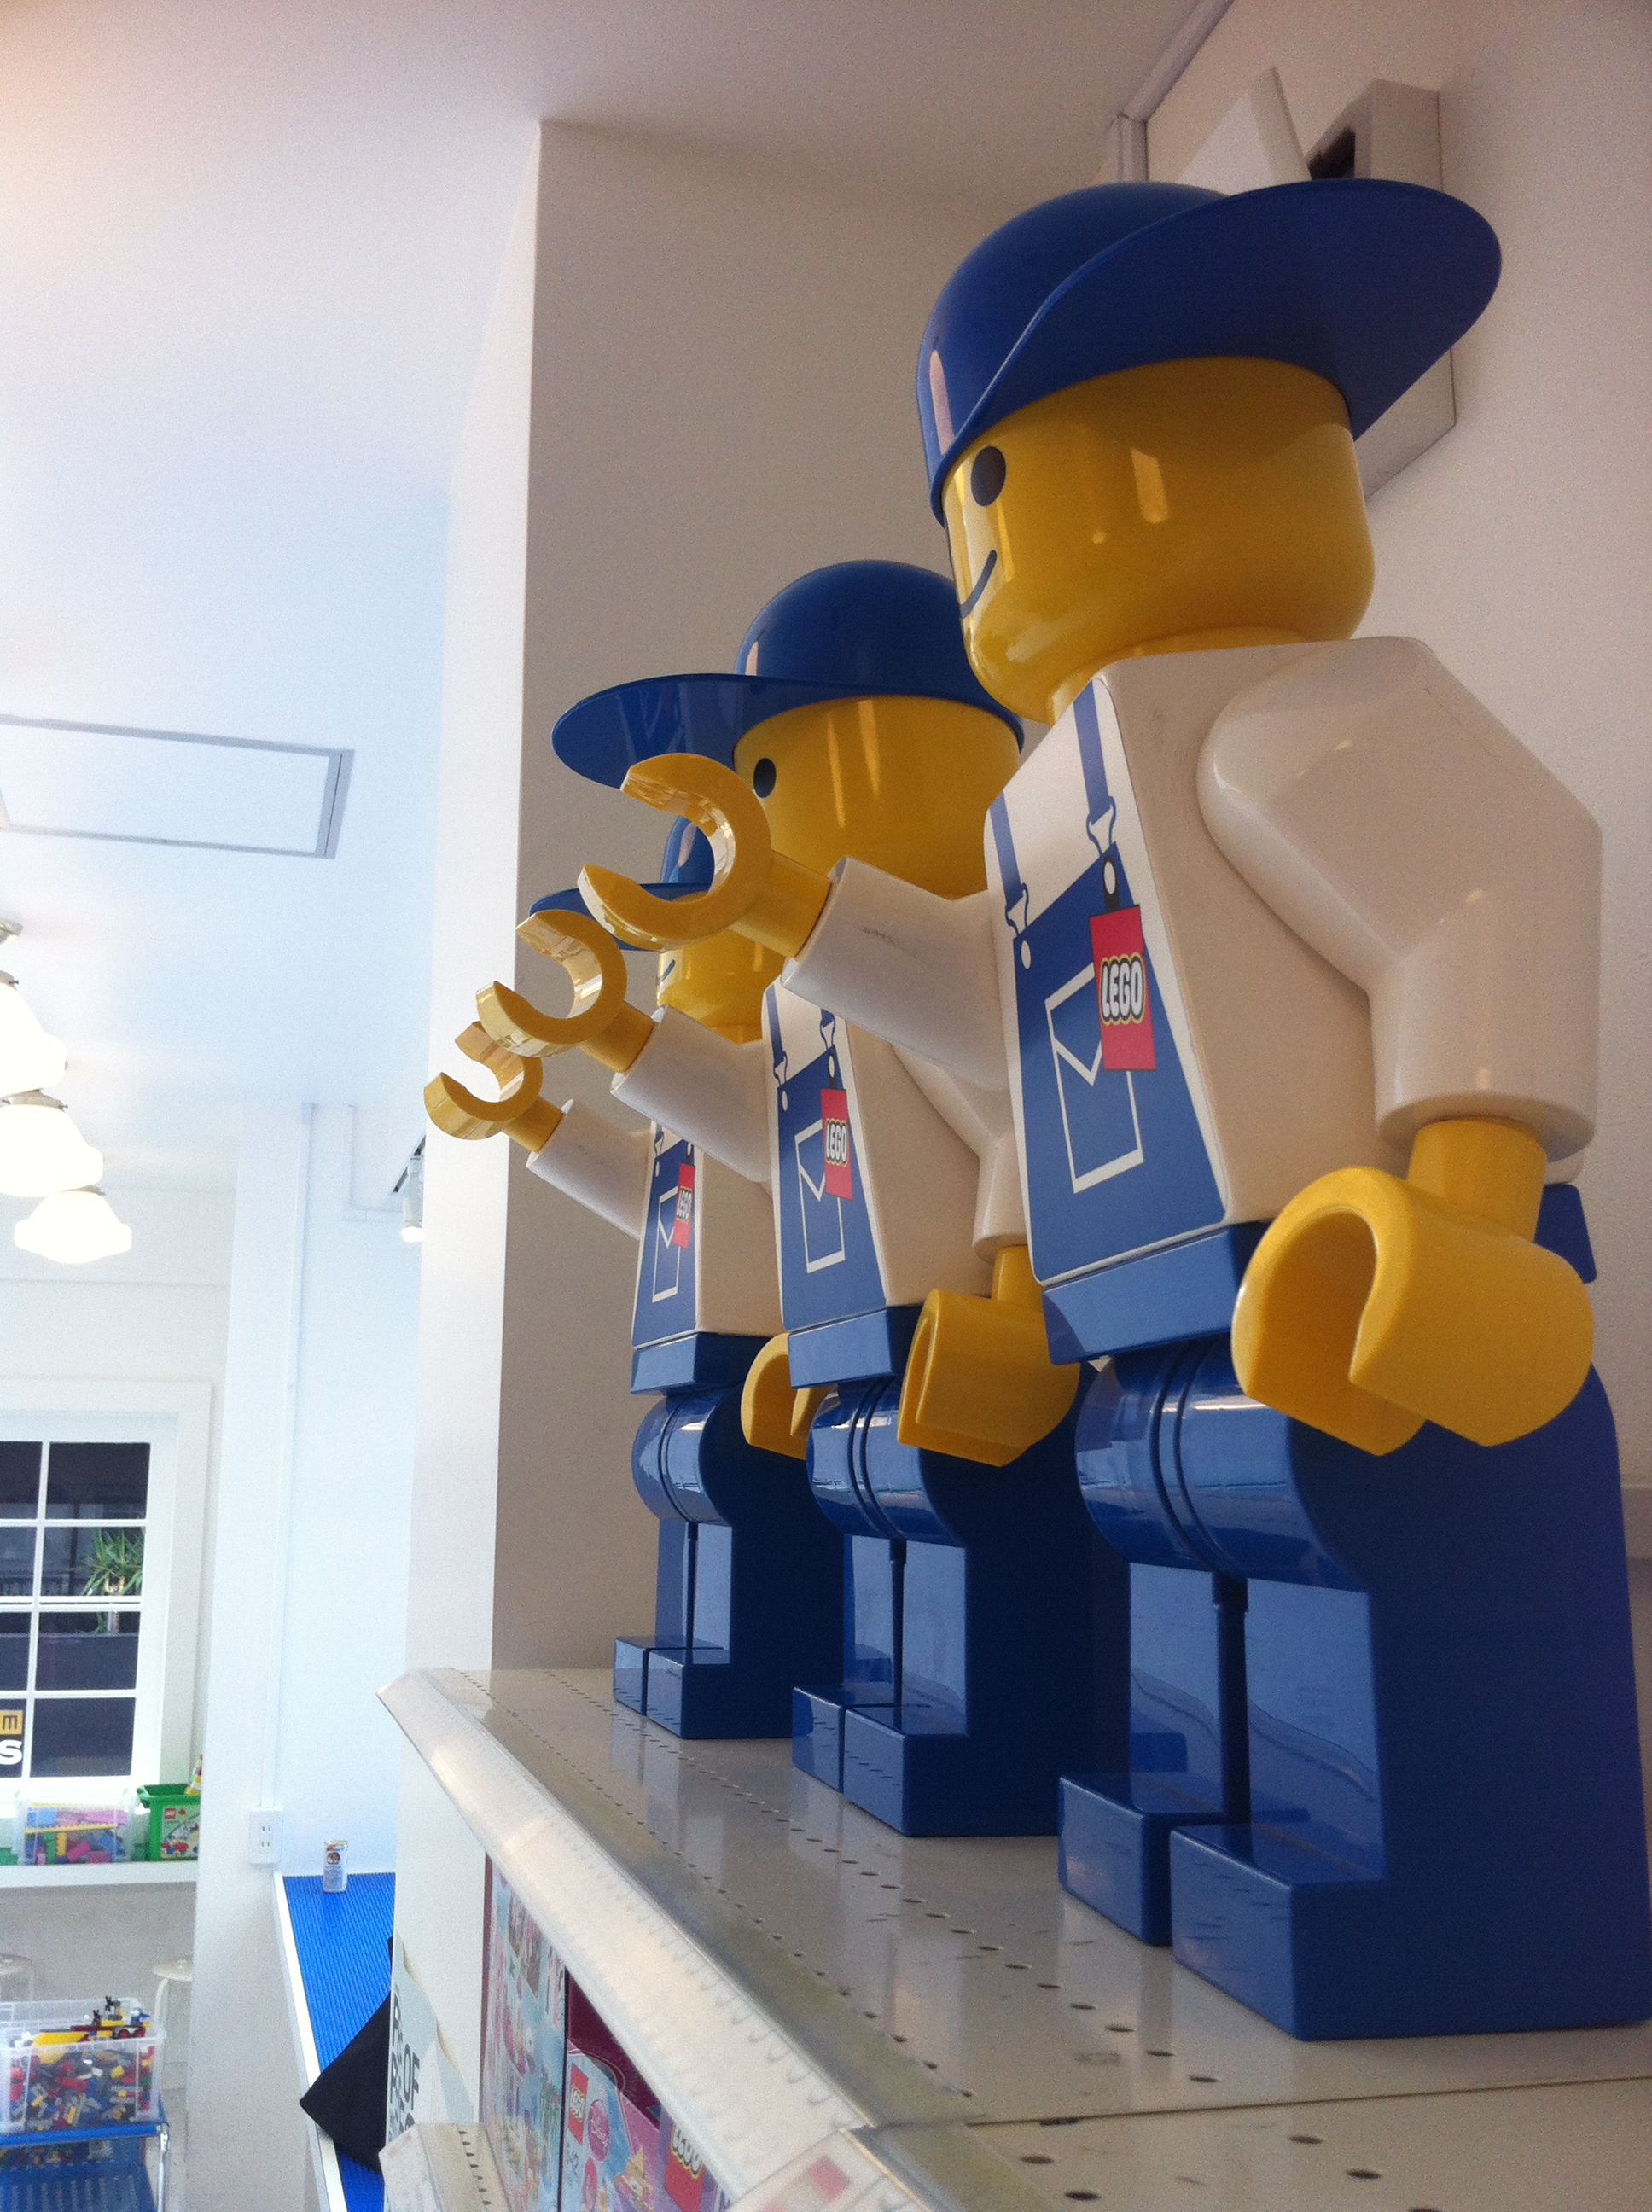 When hiddenlol'ers stop by the LEGO shop